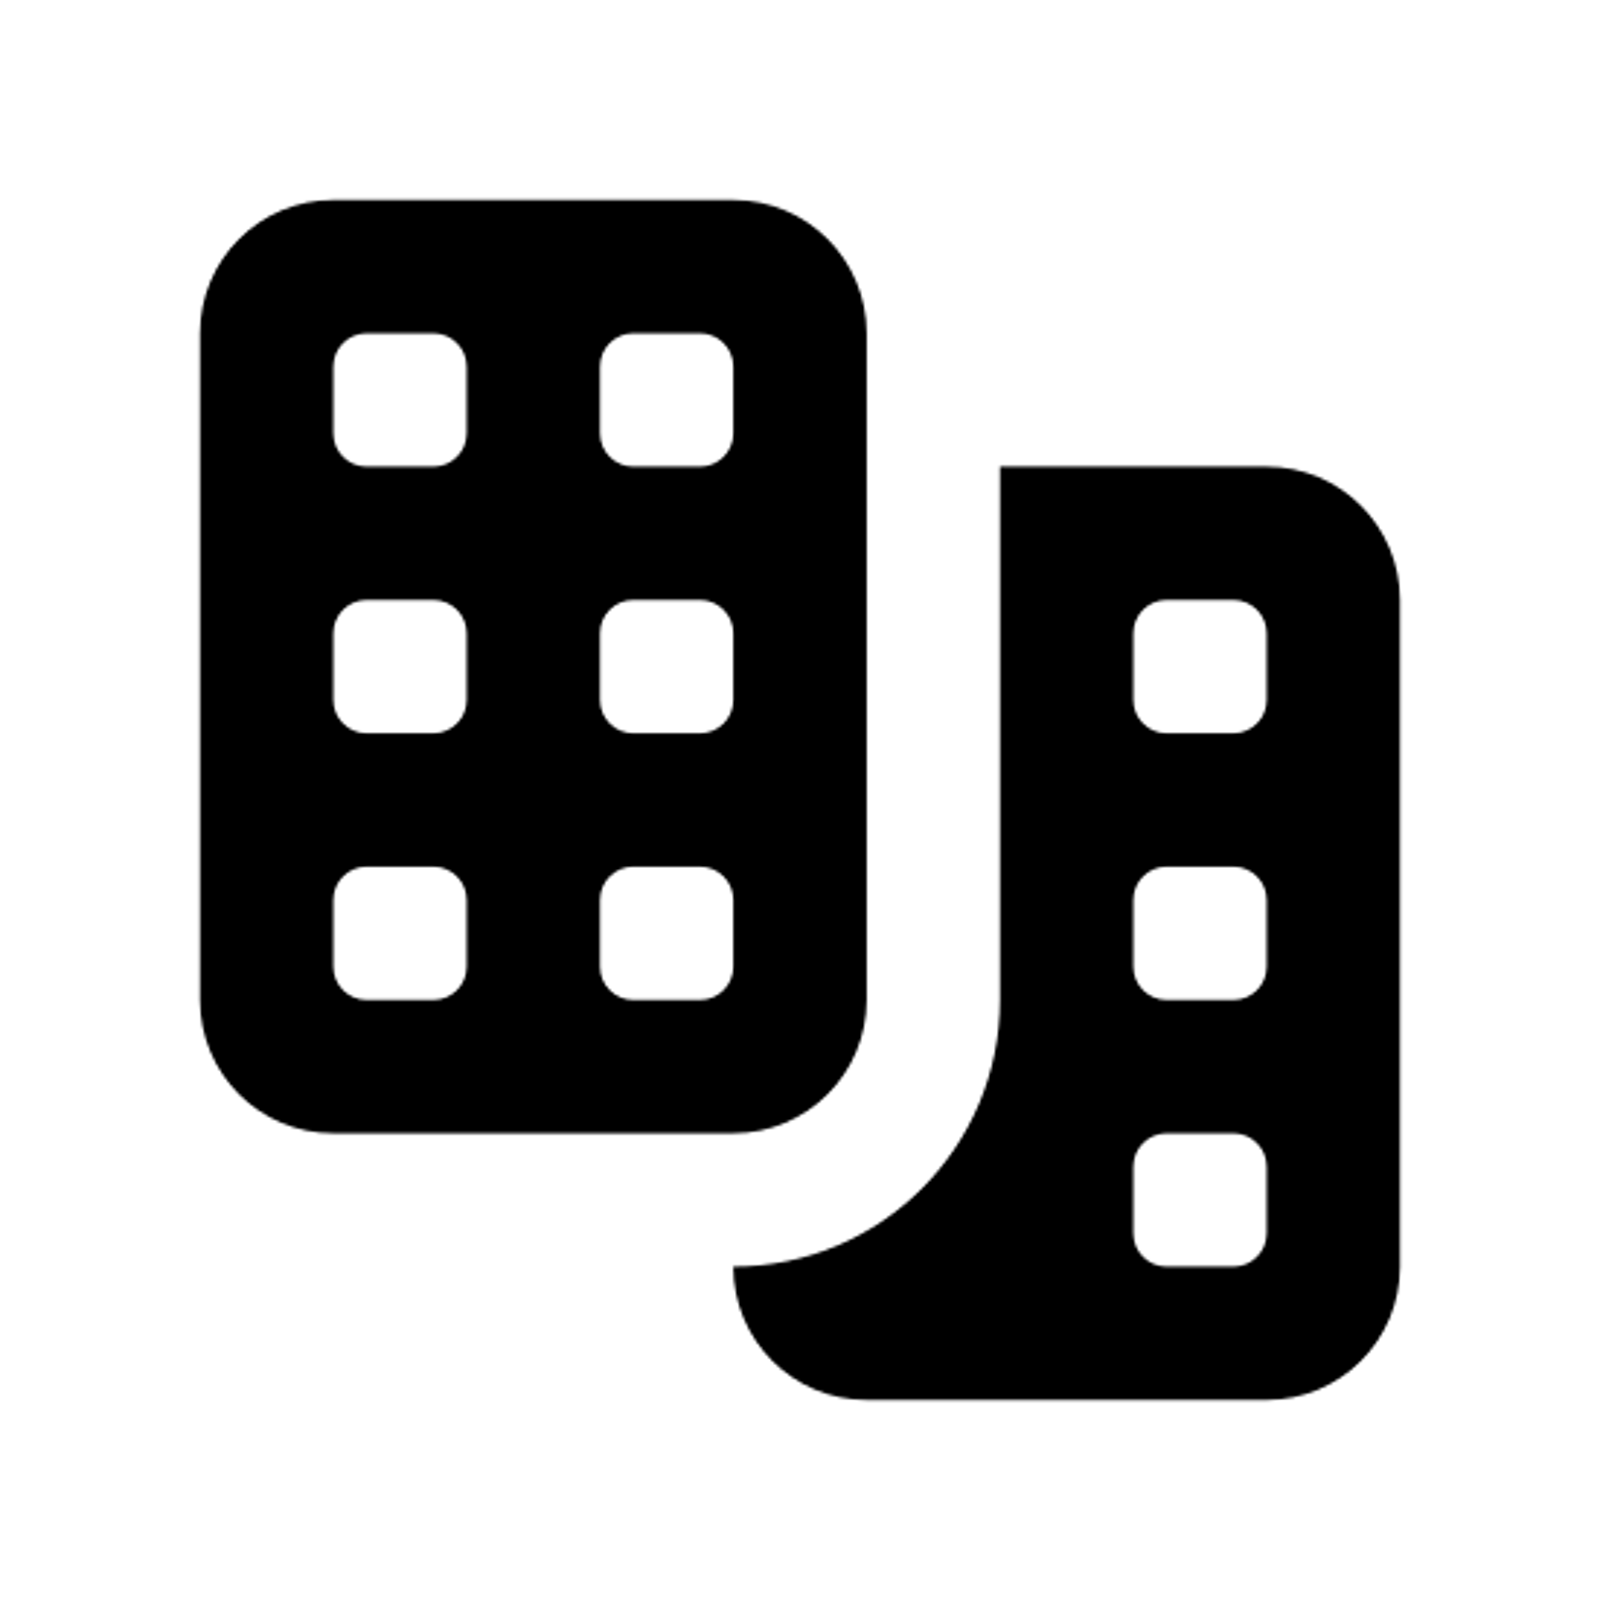 Condo icon